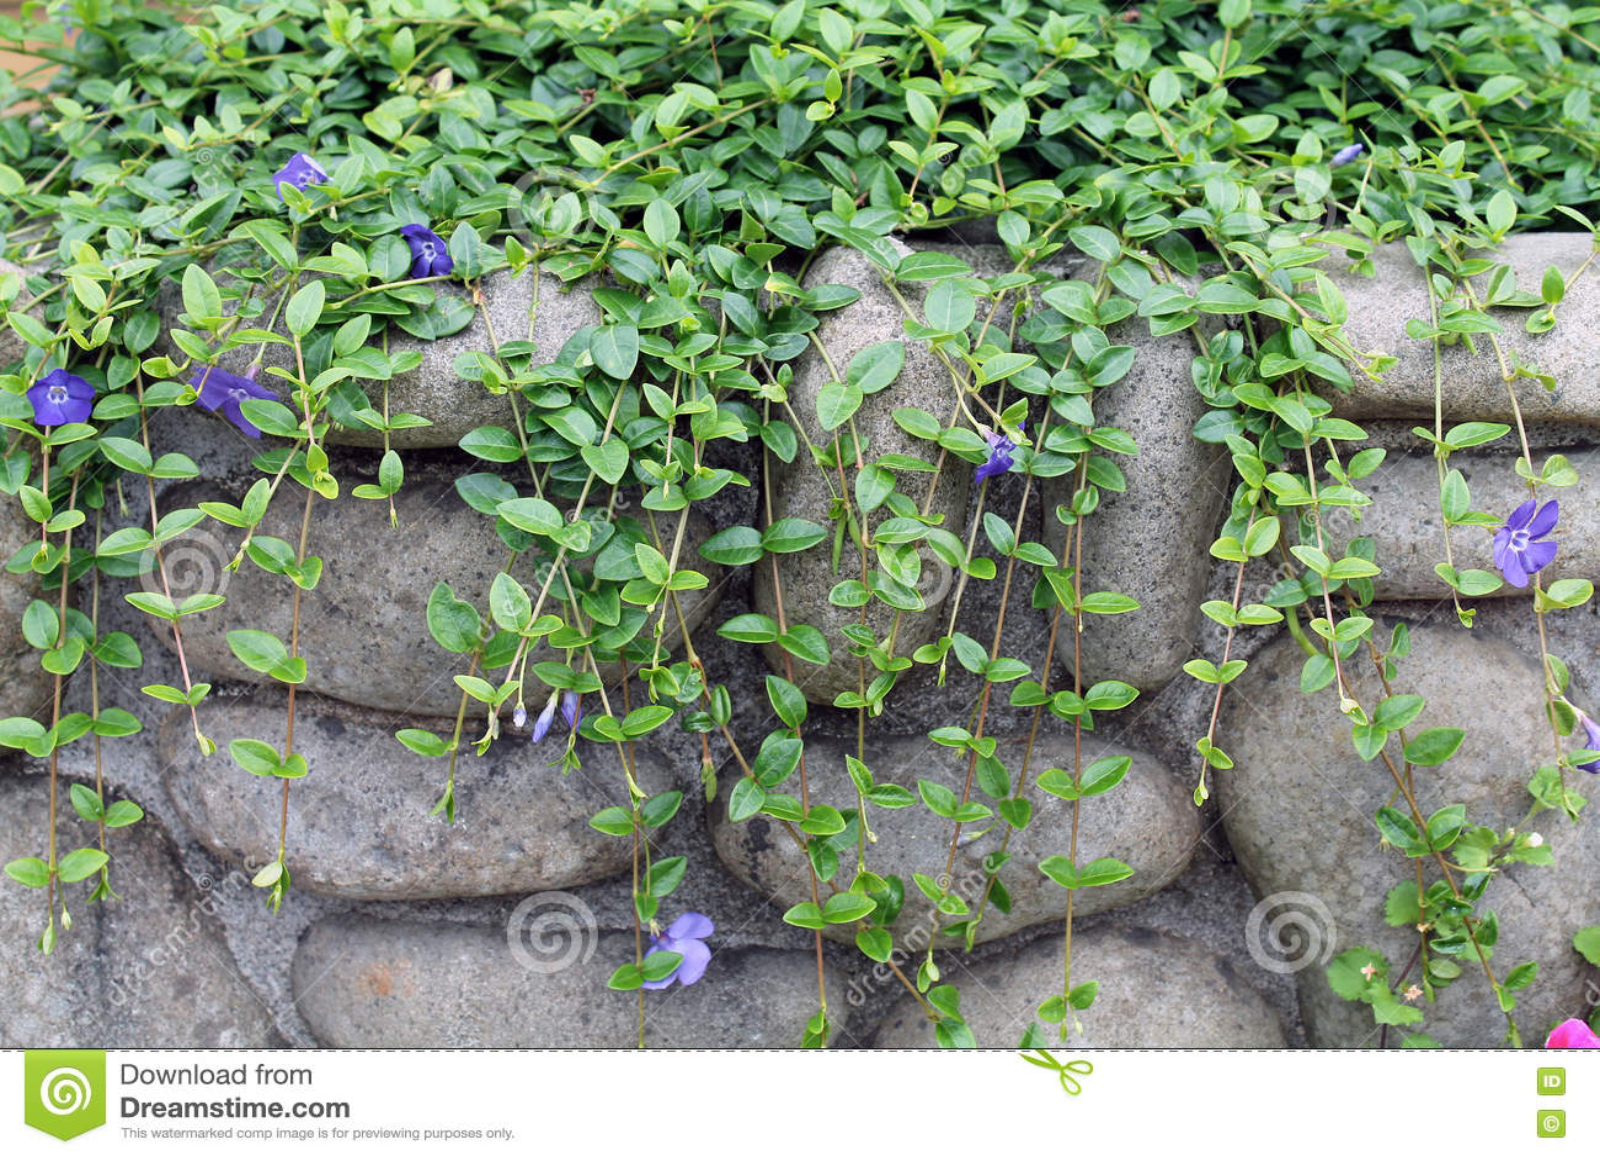 Climbing Vine Purple Flowers Rock Wall Stock Photos Download 4